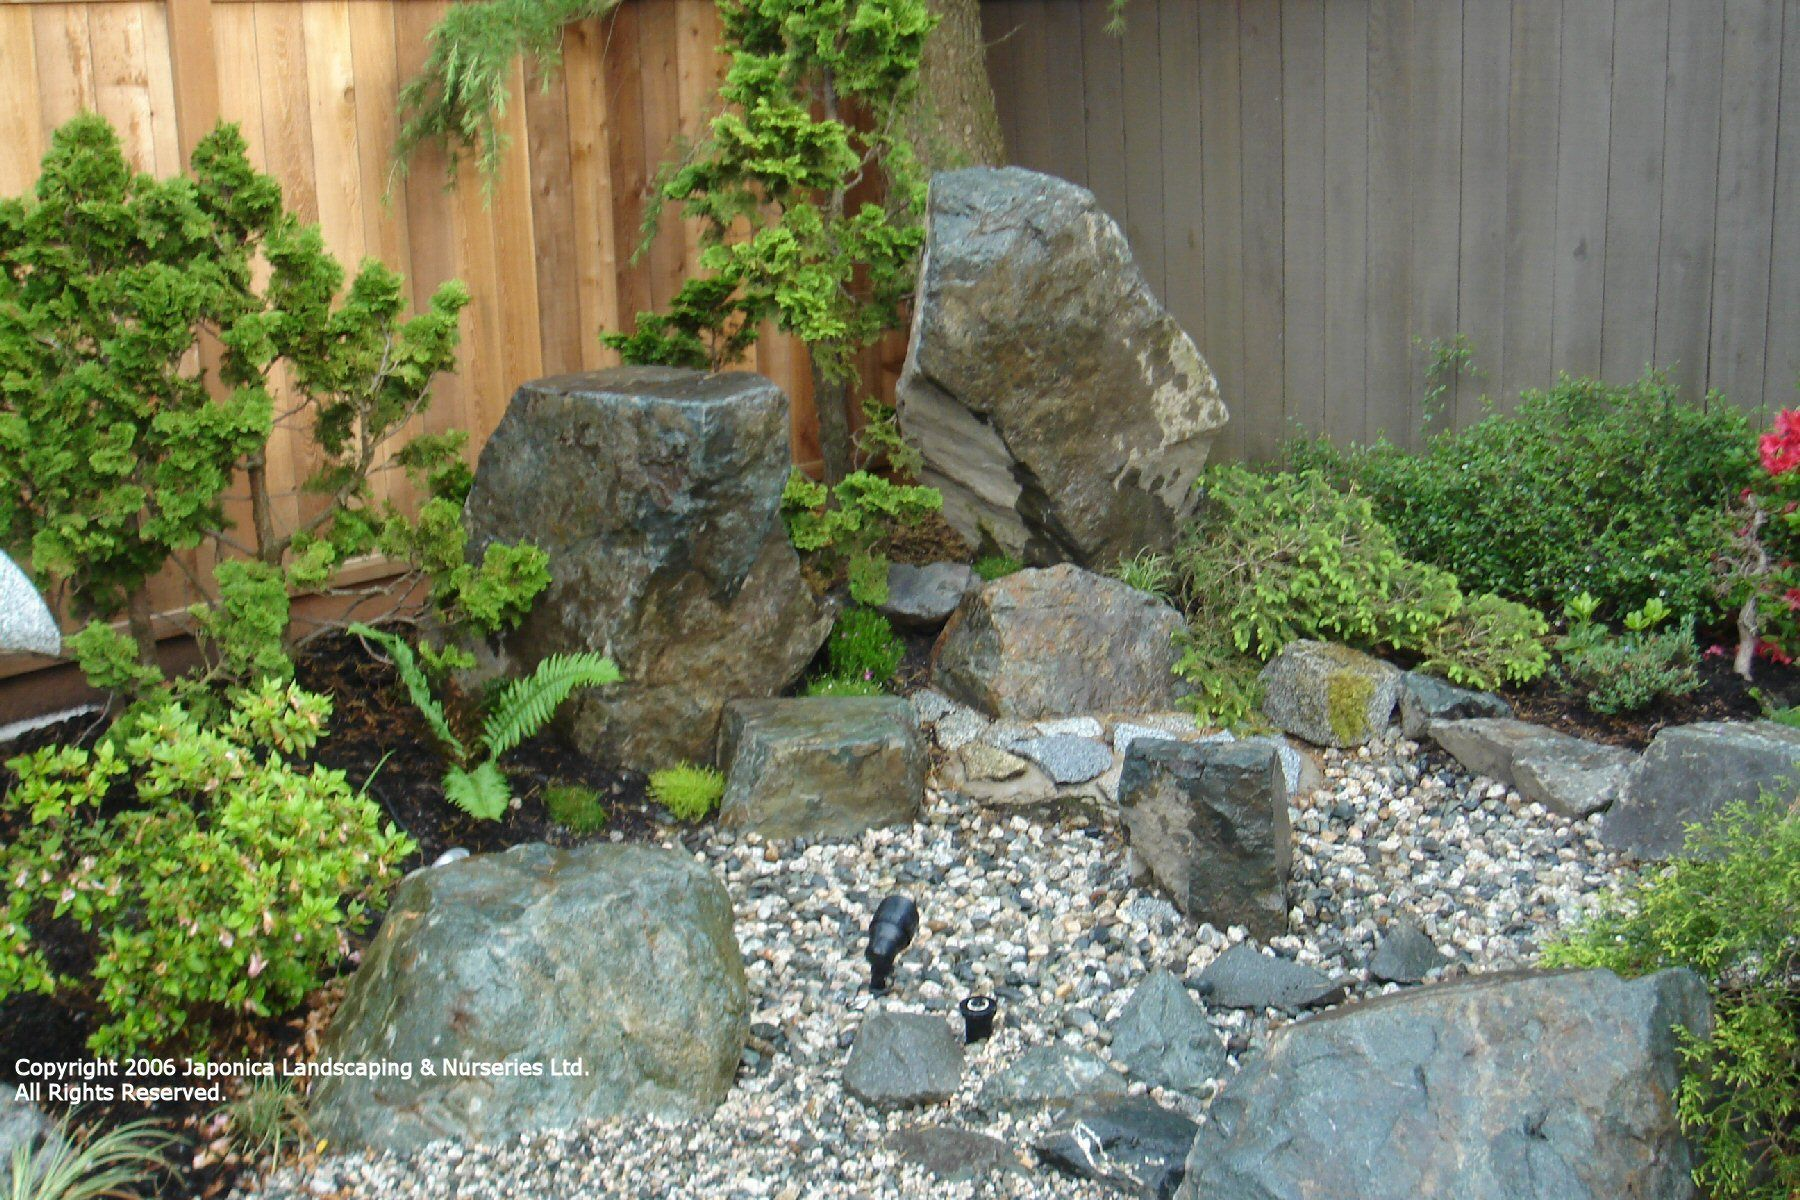 Pictures Of Small Garden Rockeries Garden Post Landscaping With Rocks Rock Garden Design Rock Garden